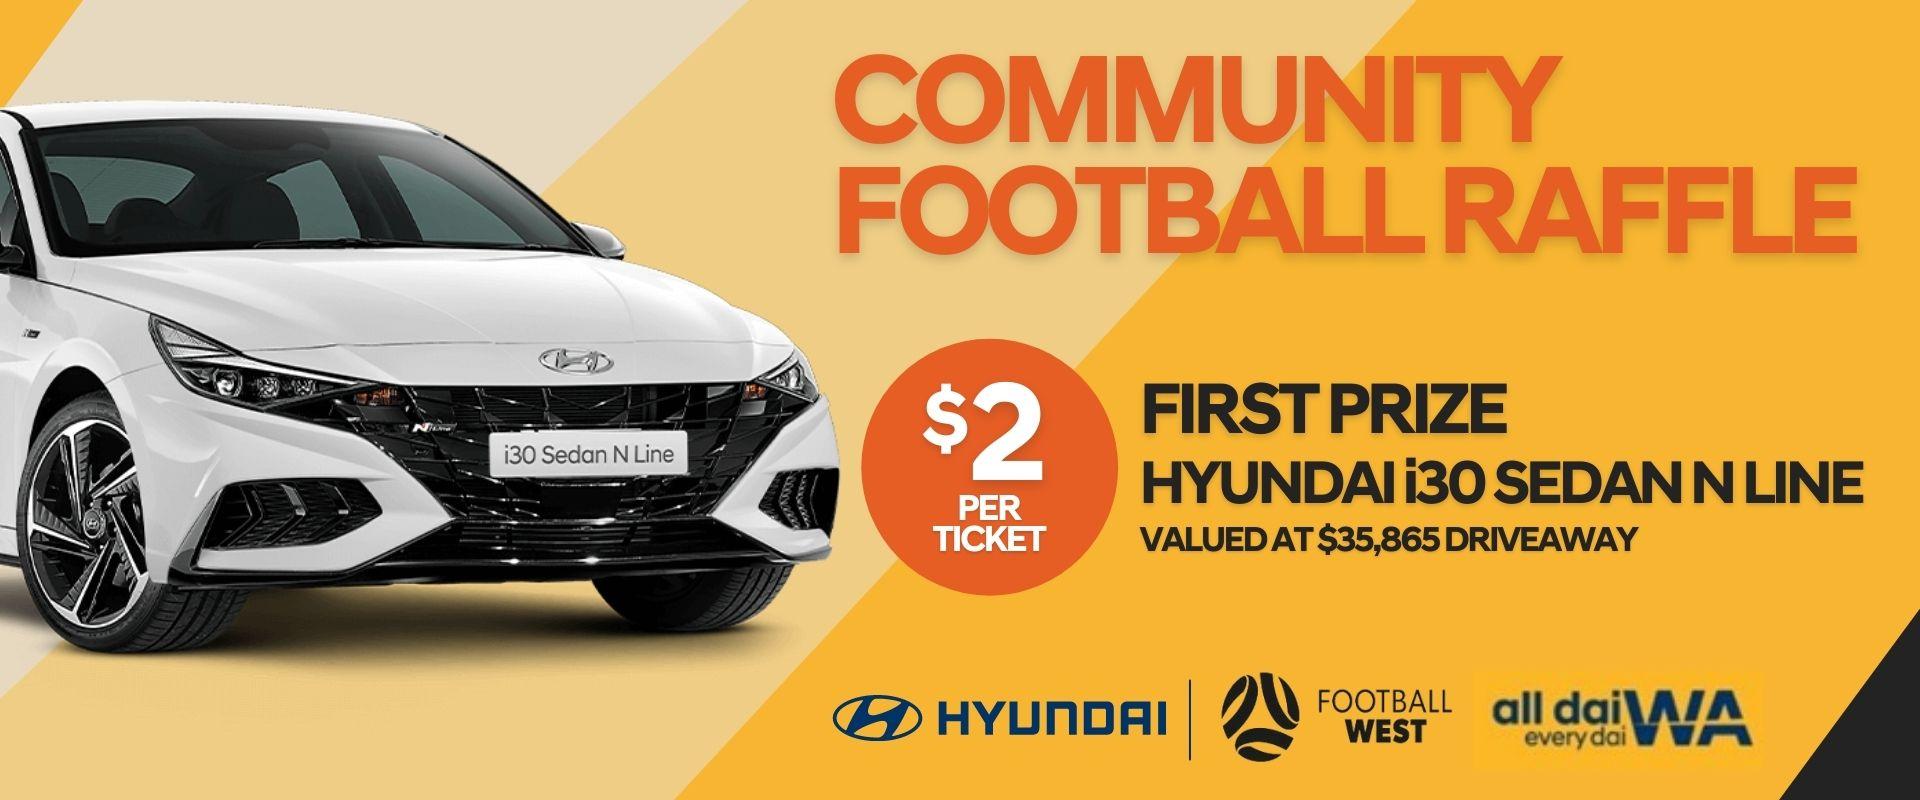 Community Football Raffle